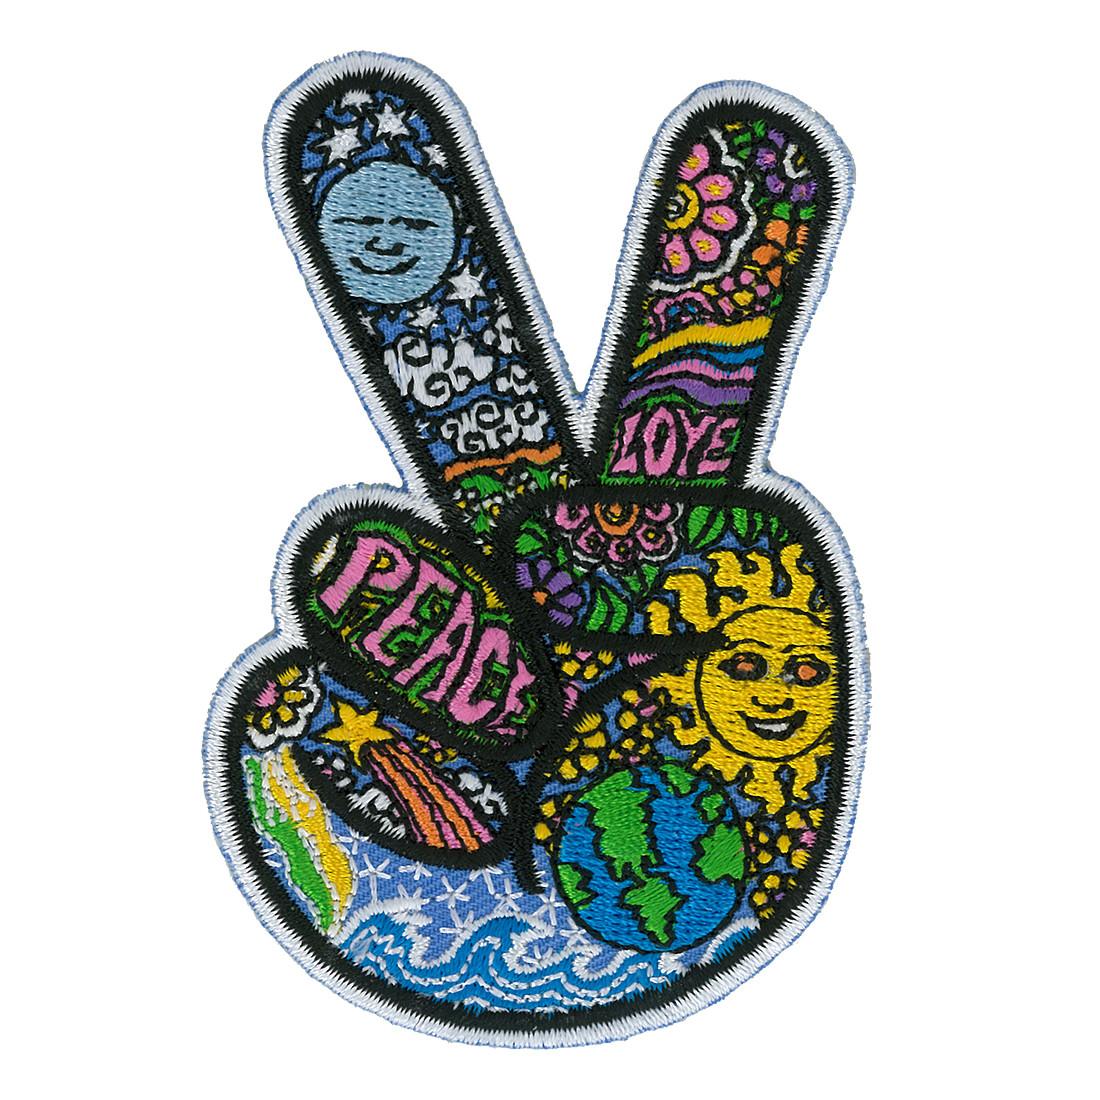 Dan Morris Peace Finger Patch